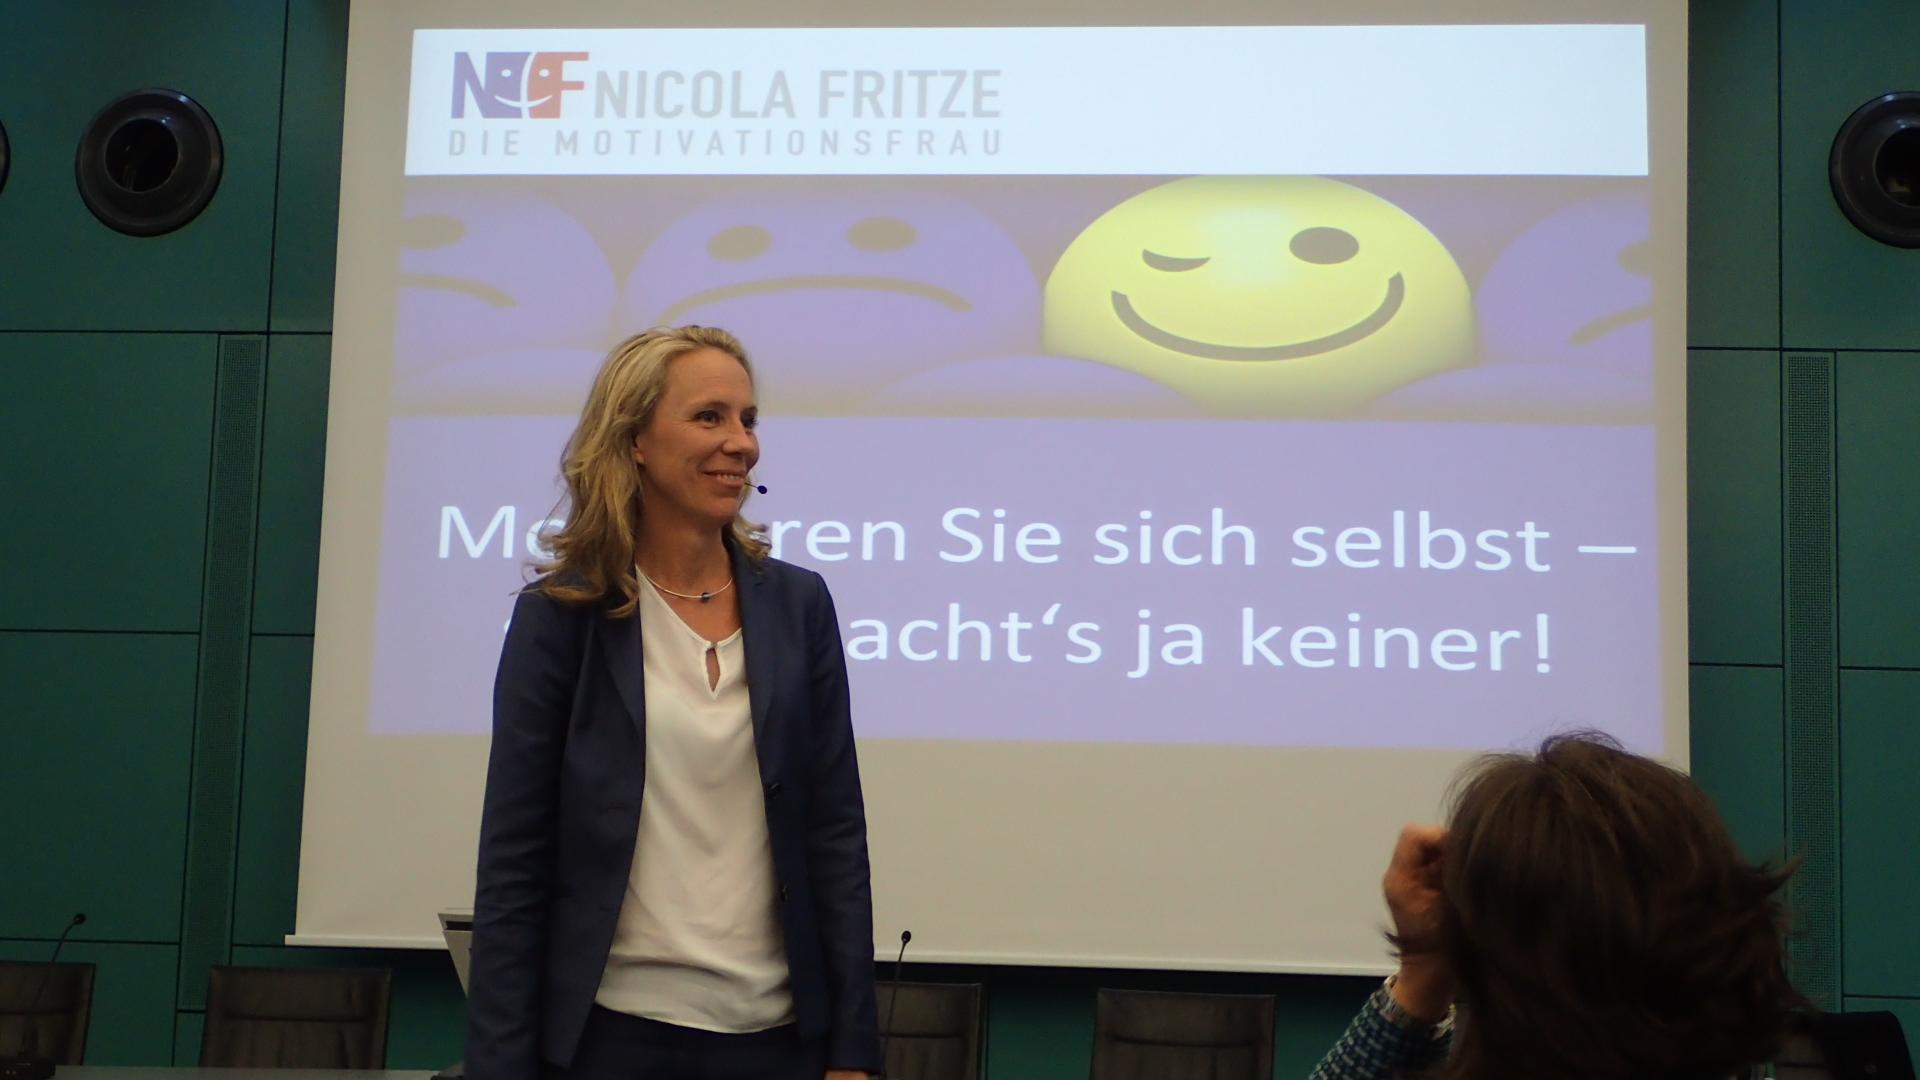 09-18 Nicola Fritze - die Motivationsfrau